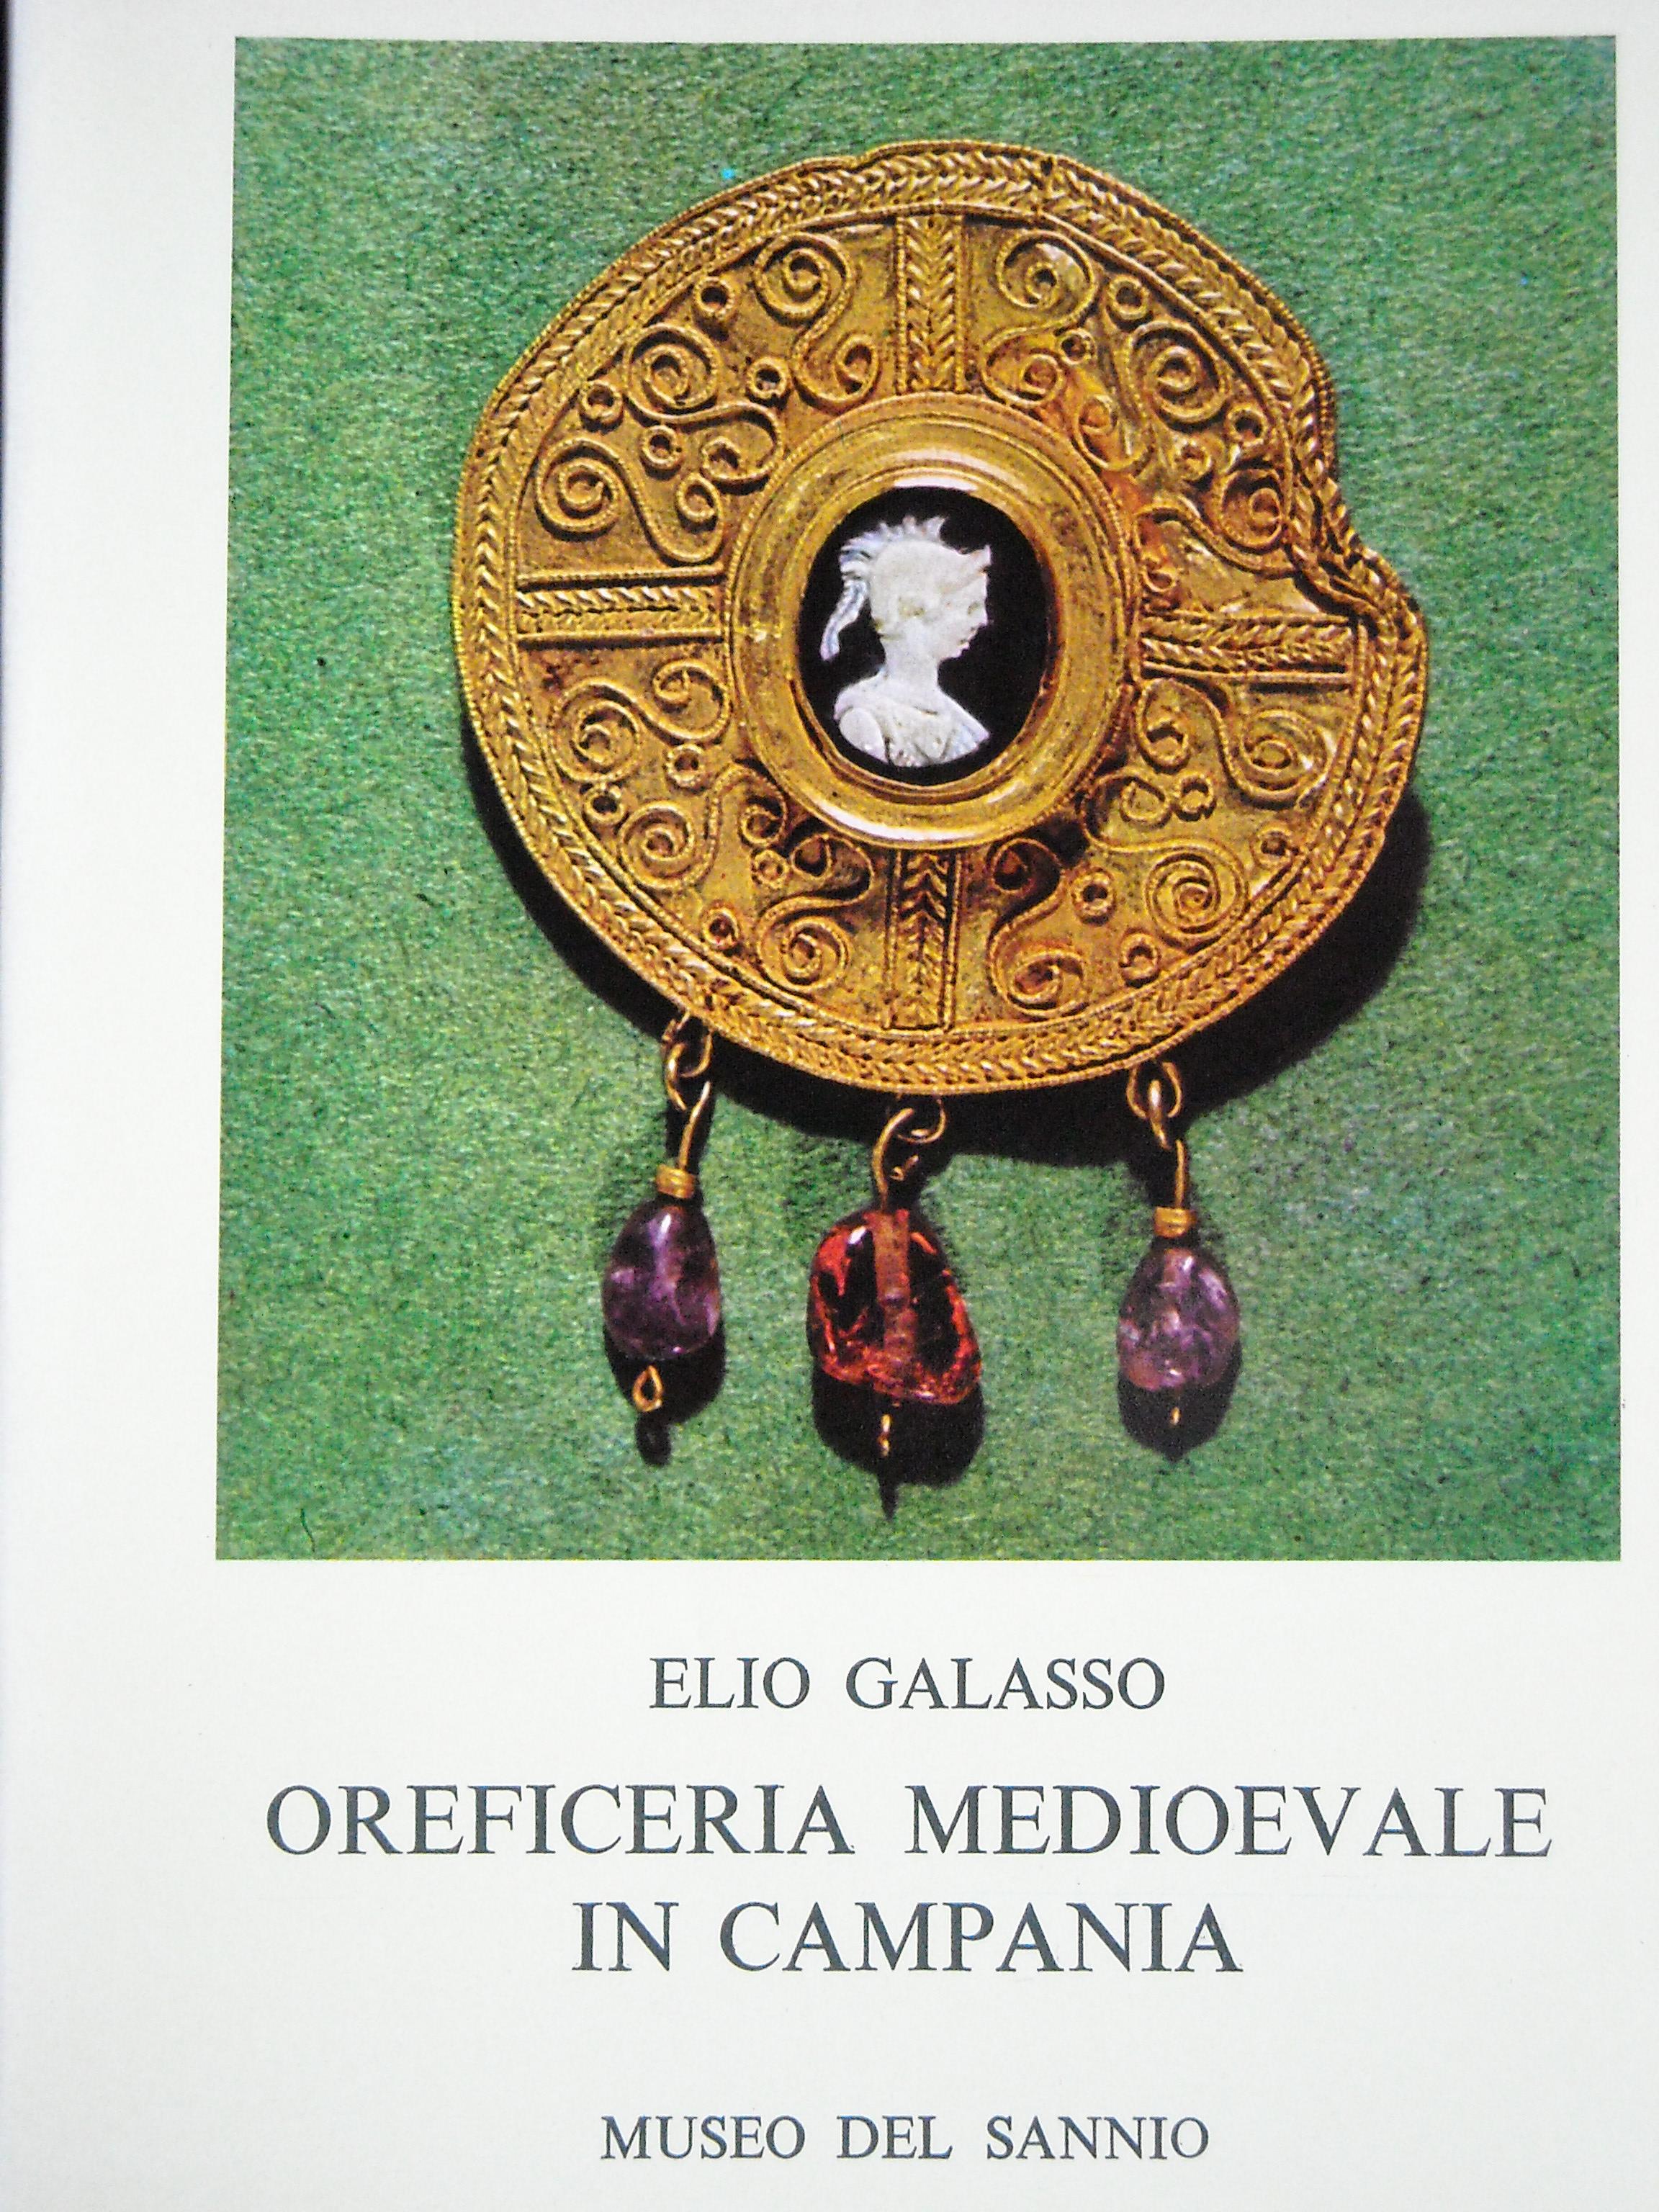 Oreficeria medioevale in Campania